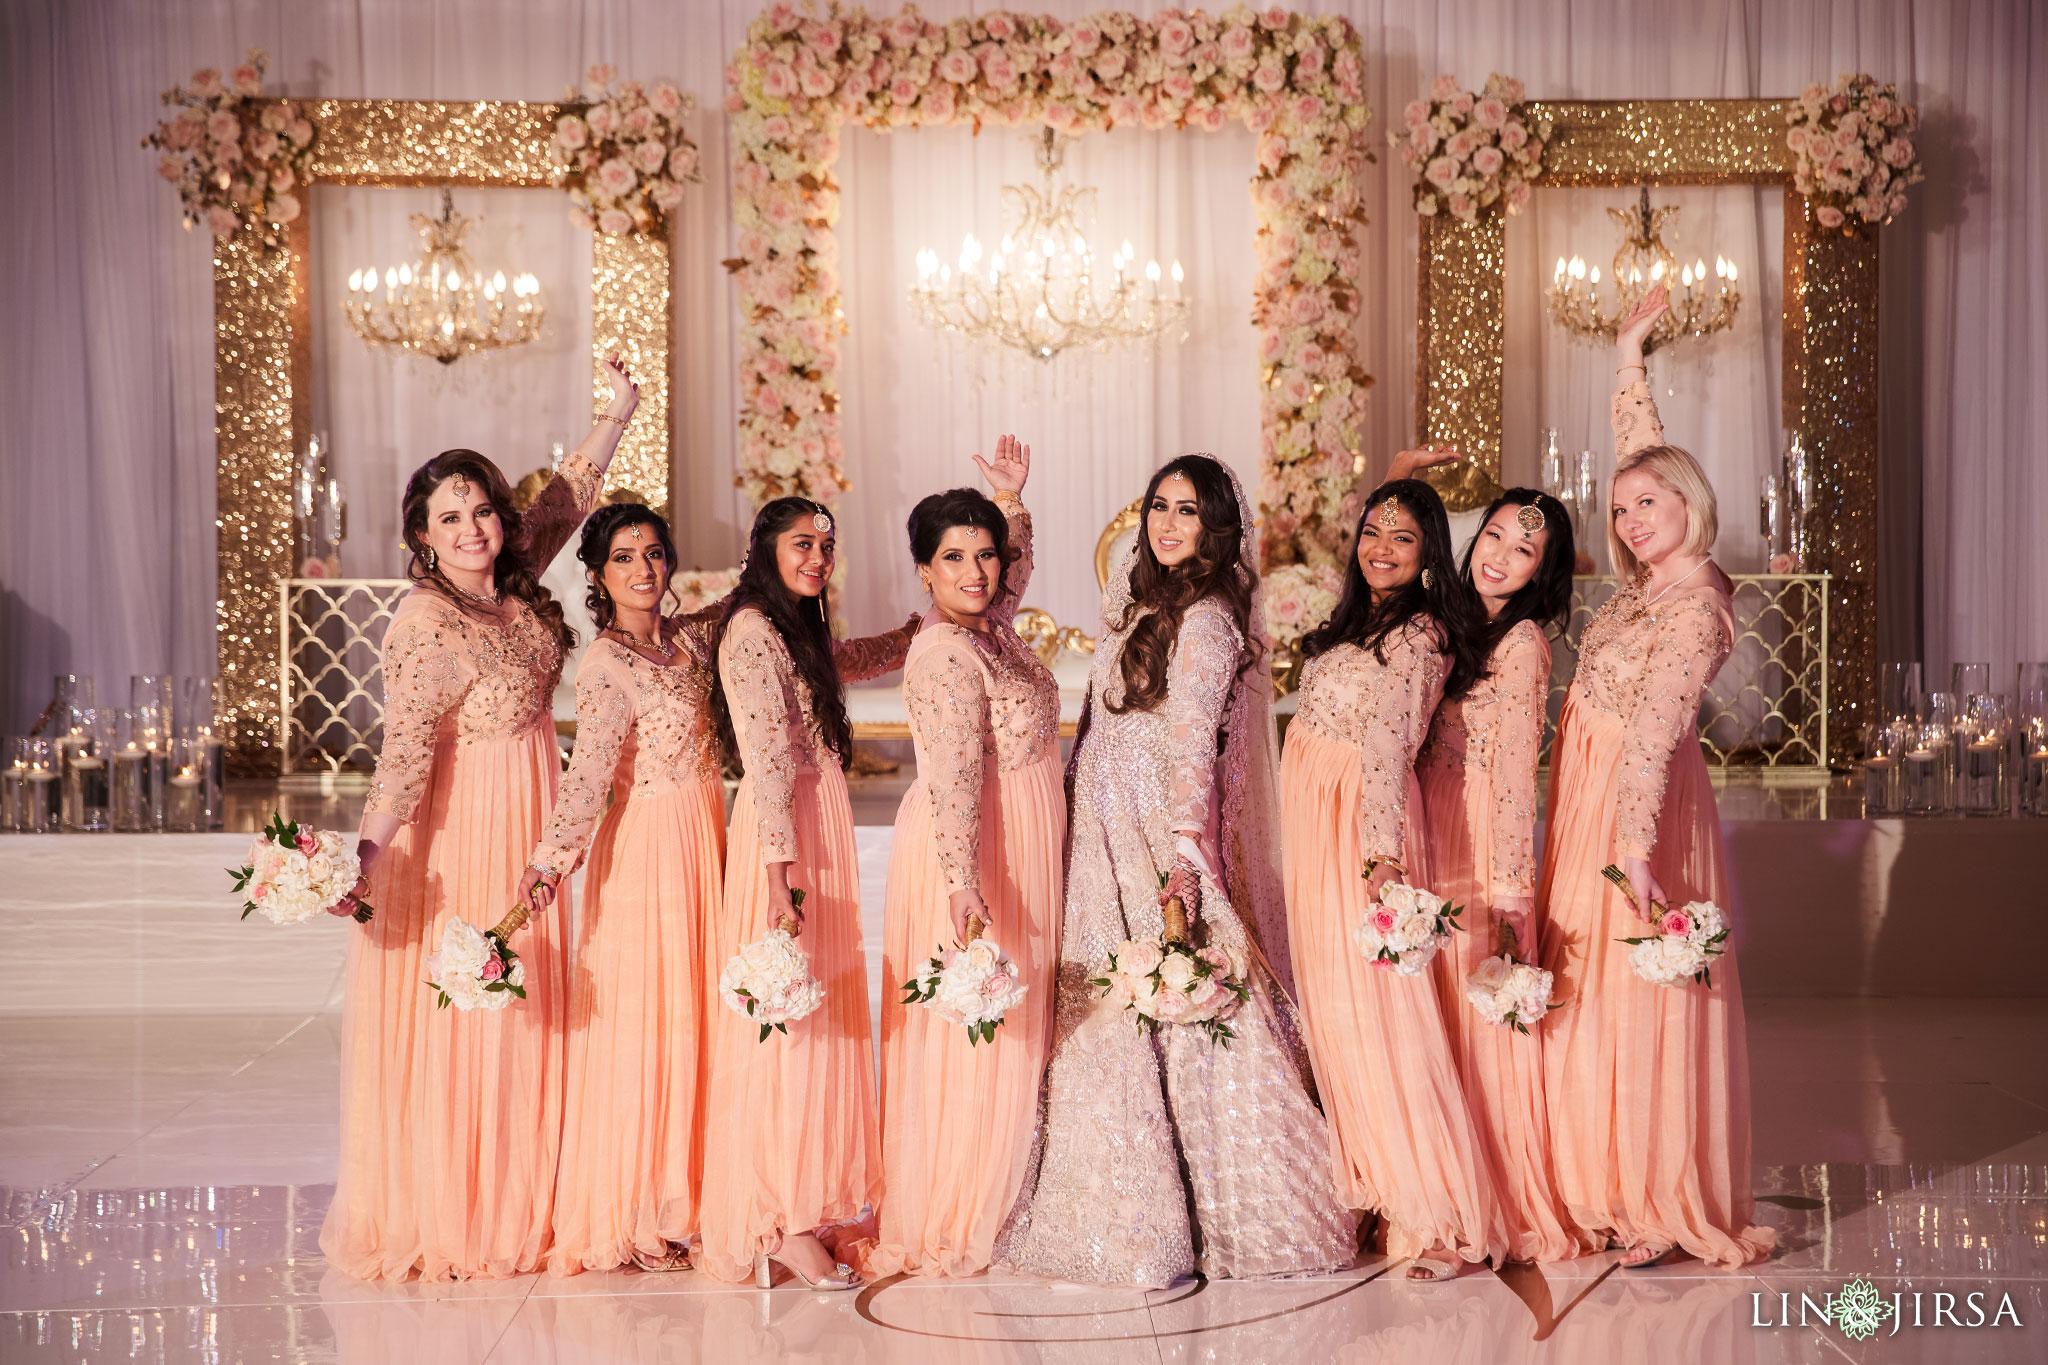 31 pasea hotel spa huntington beach pakistani muslim wedding photography